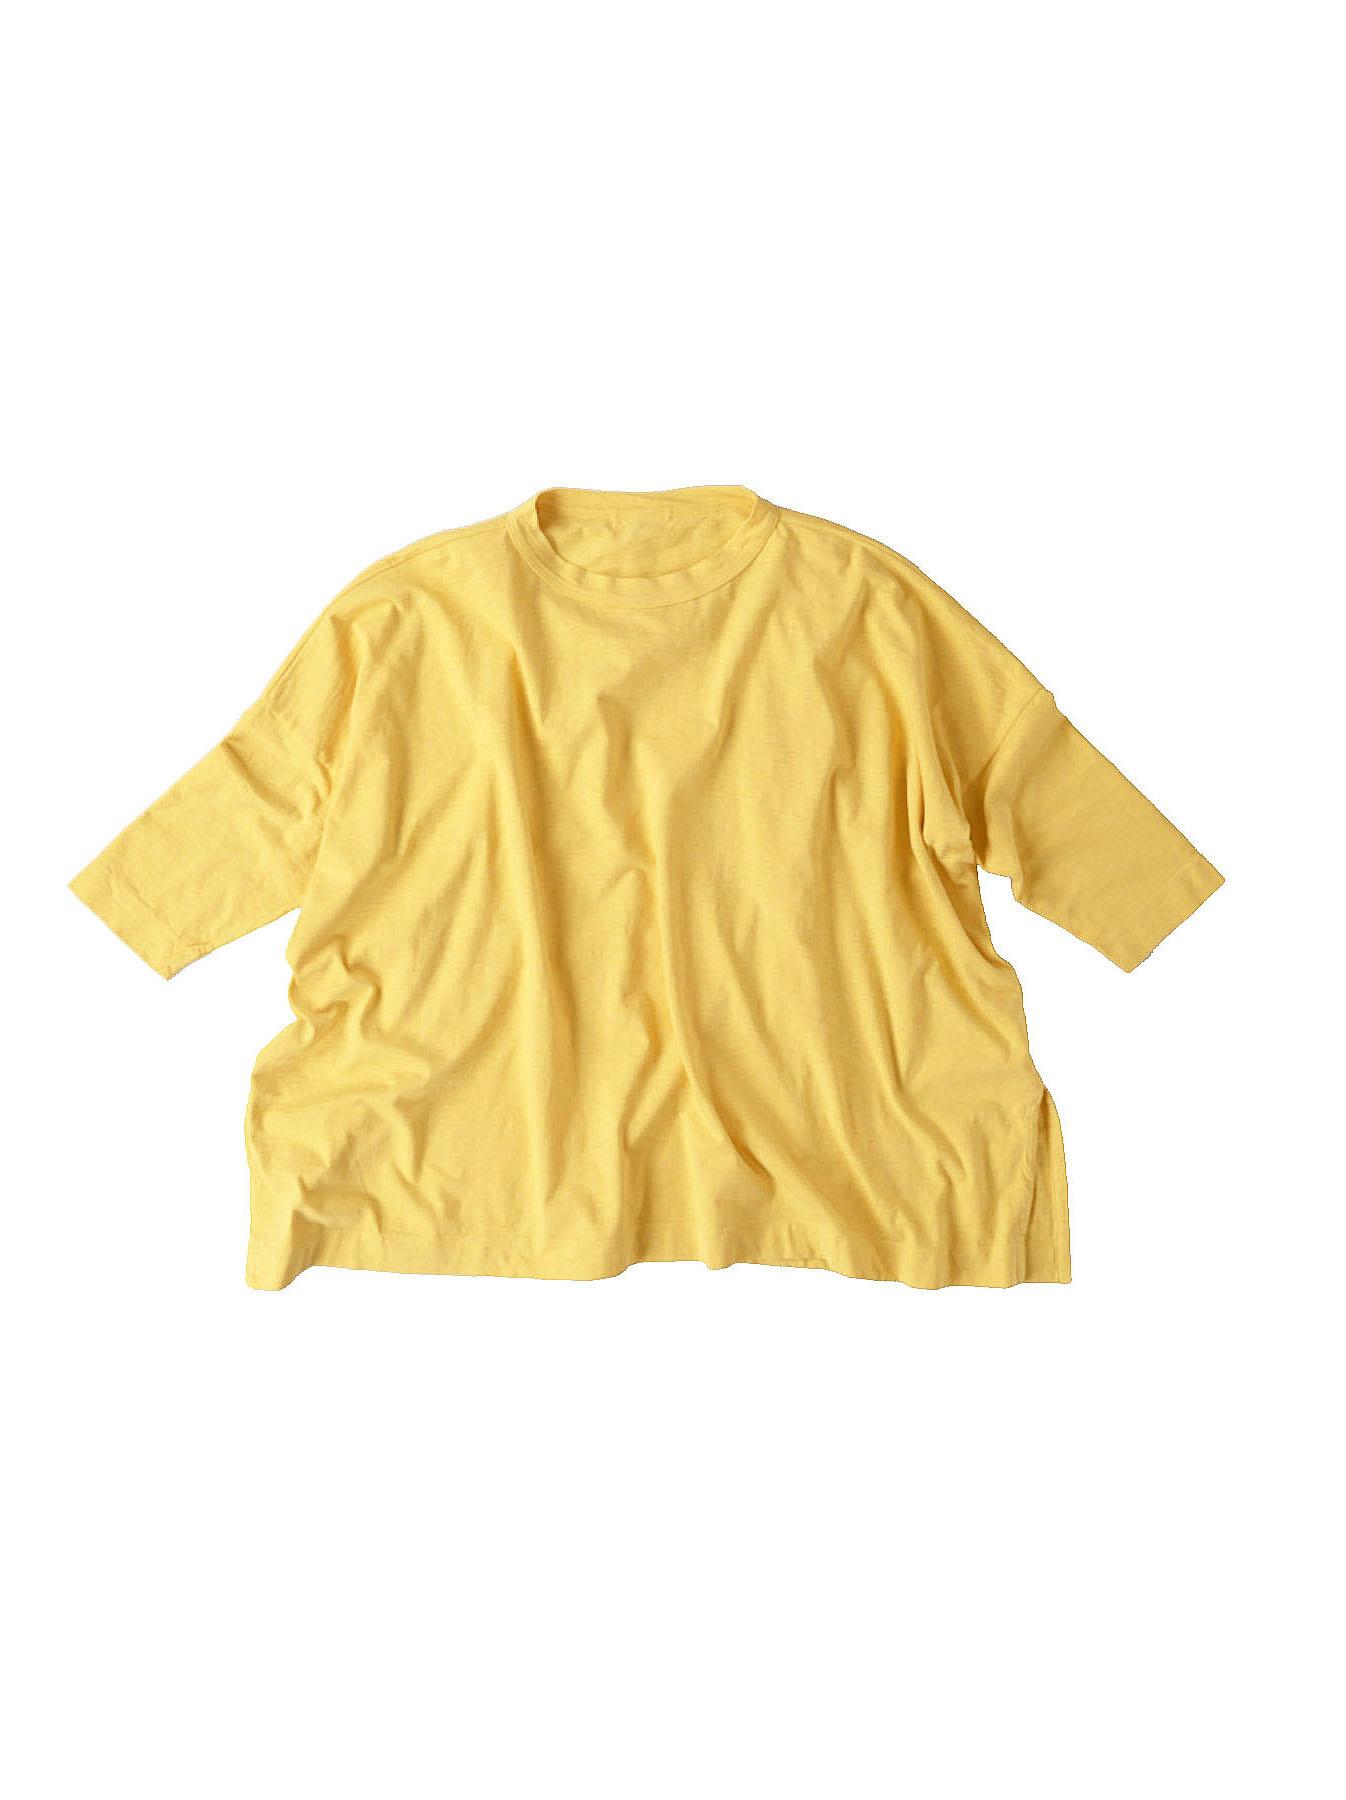 Zimbabwe Cotton Big Slit T-shirt (0721)-12